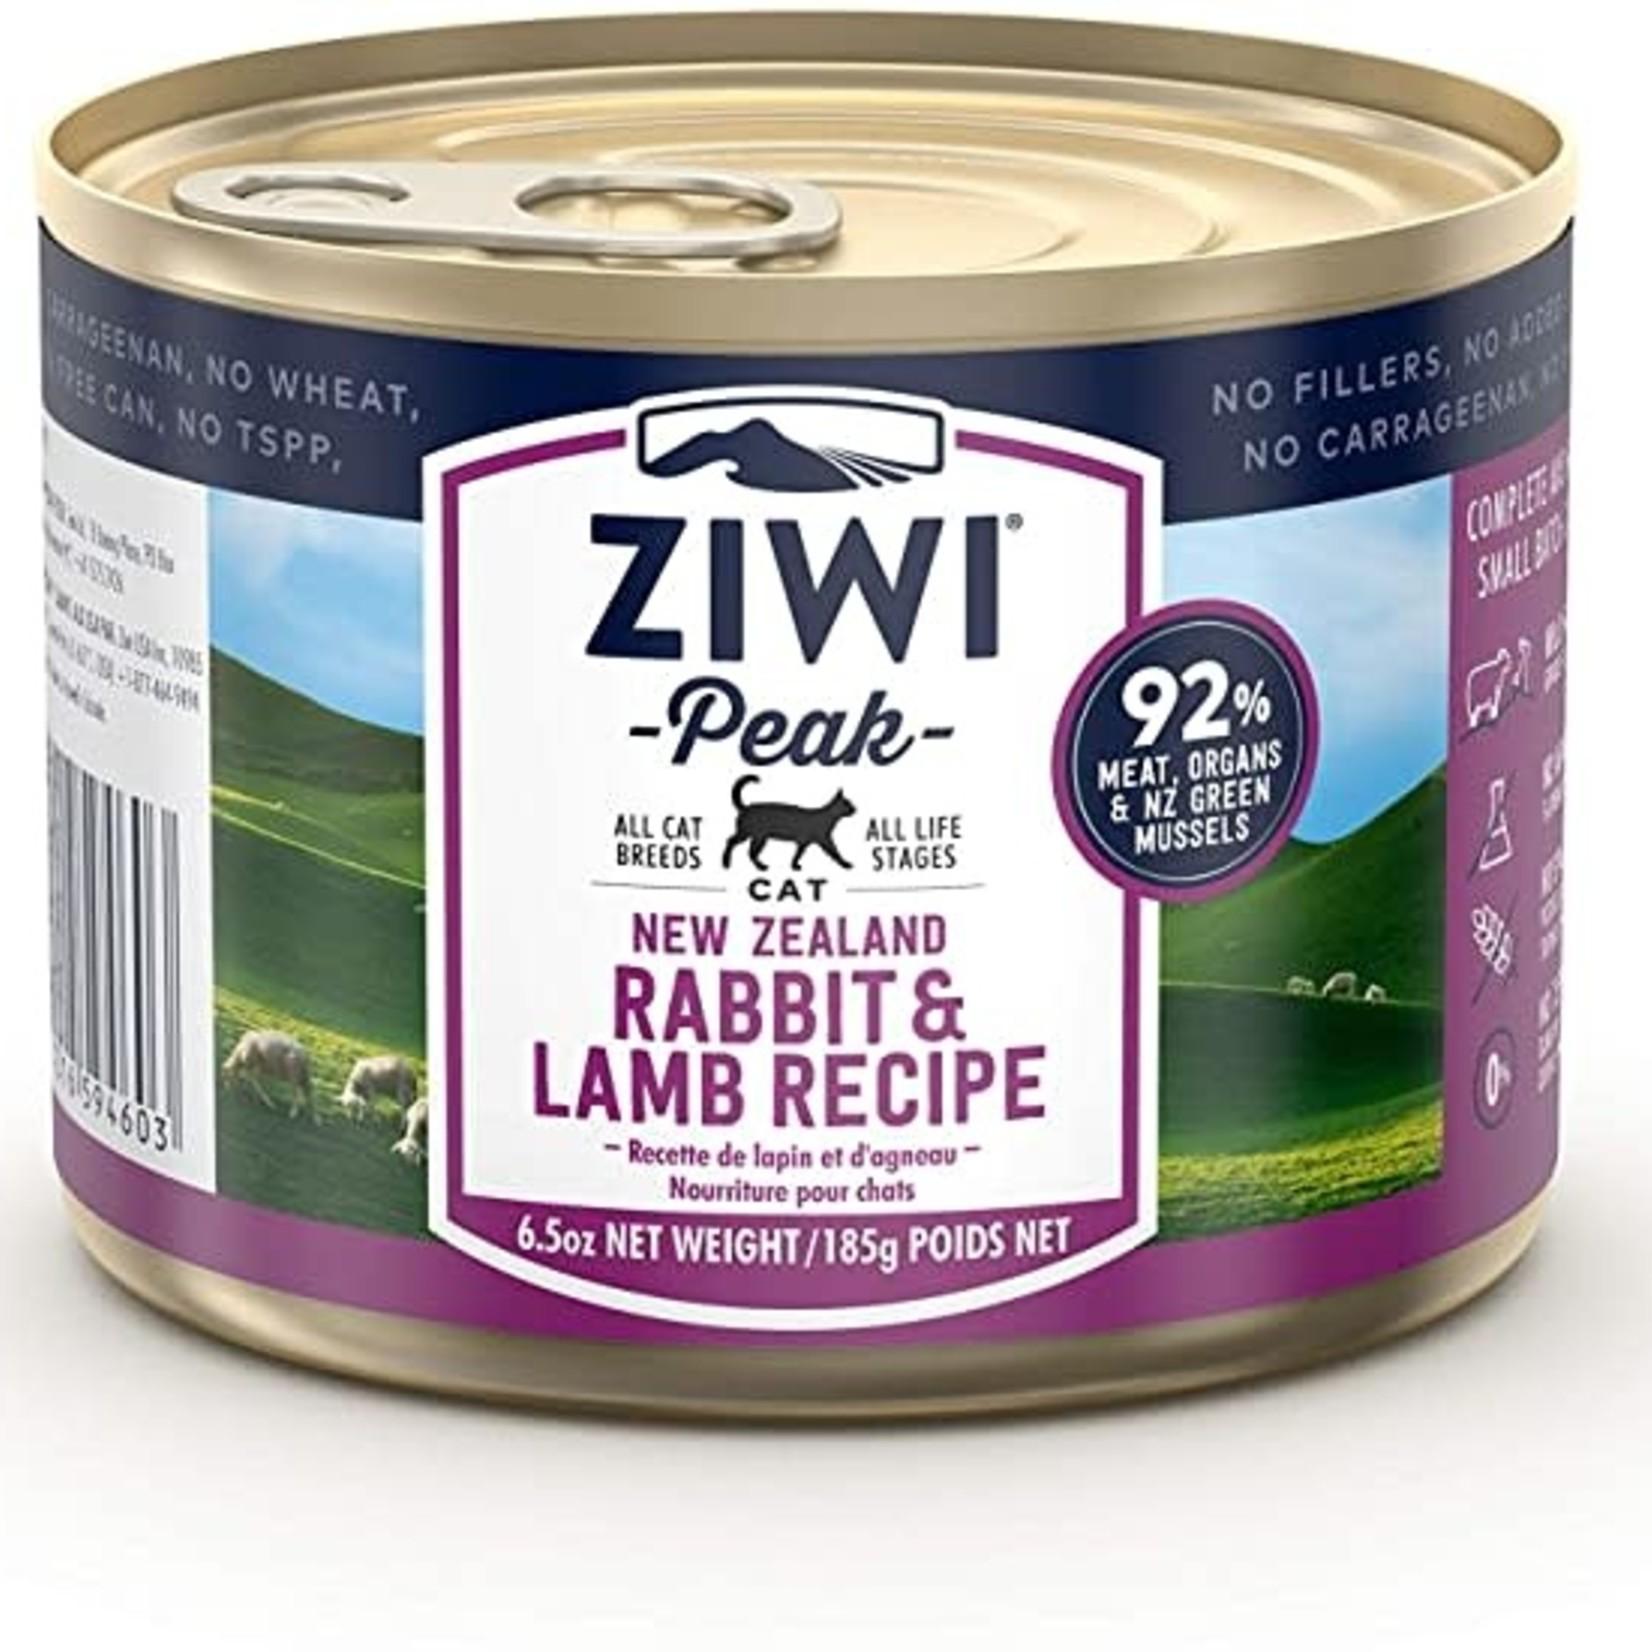 Ziwi Peak Ziwi Peak Cat Grain Free Rabbit & Lamb 6.5 OZ